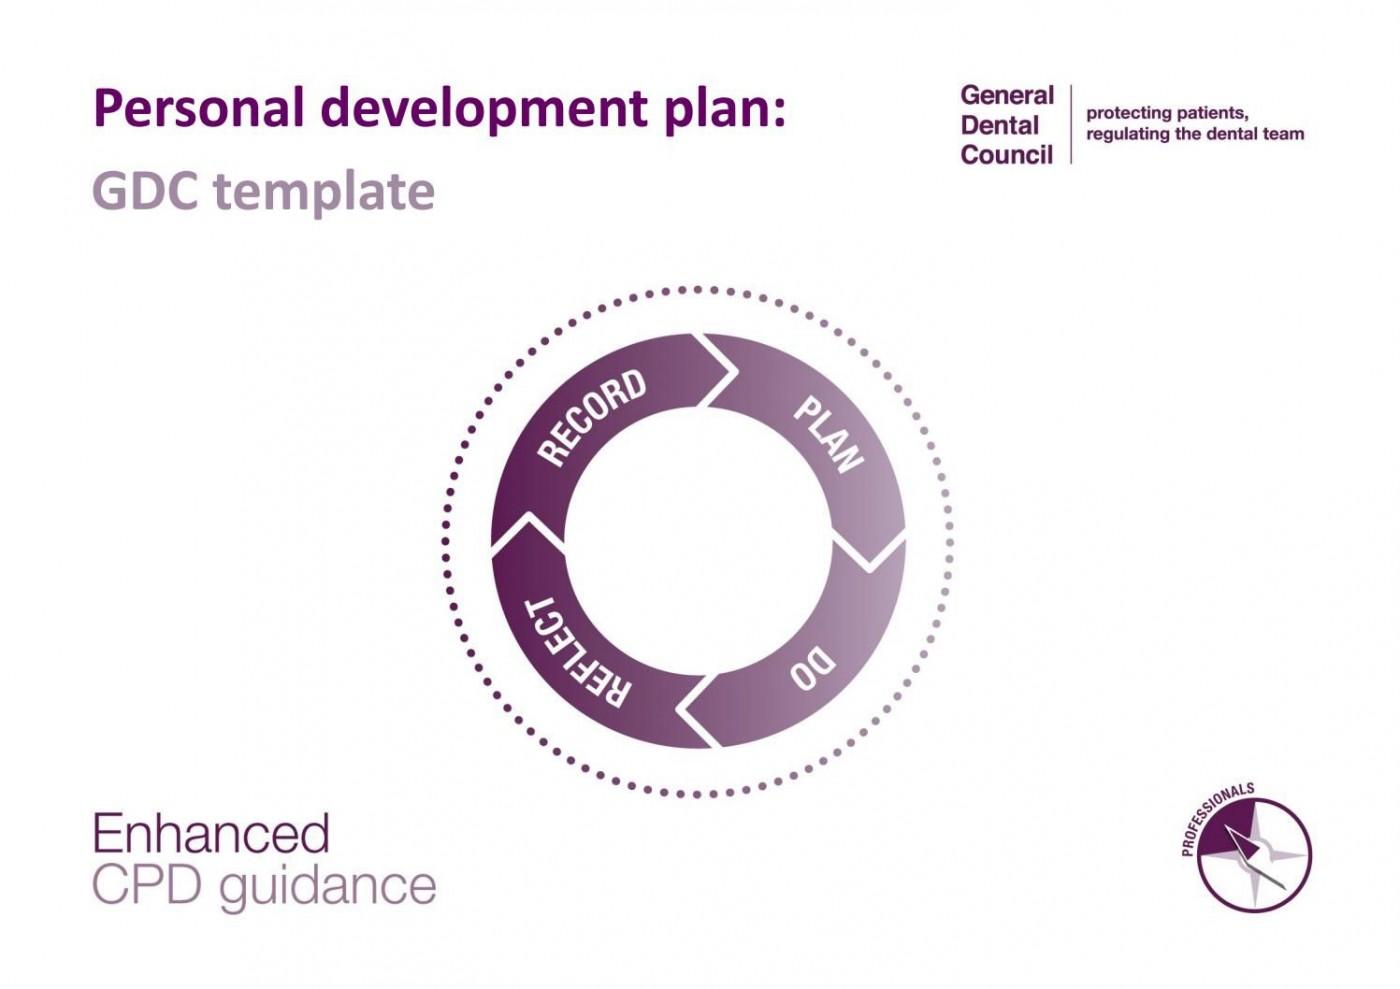 004 Excellent Personal Development Plan Template Gdc Highest Quality  Free1400